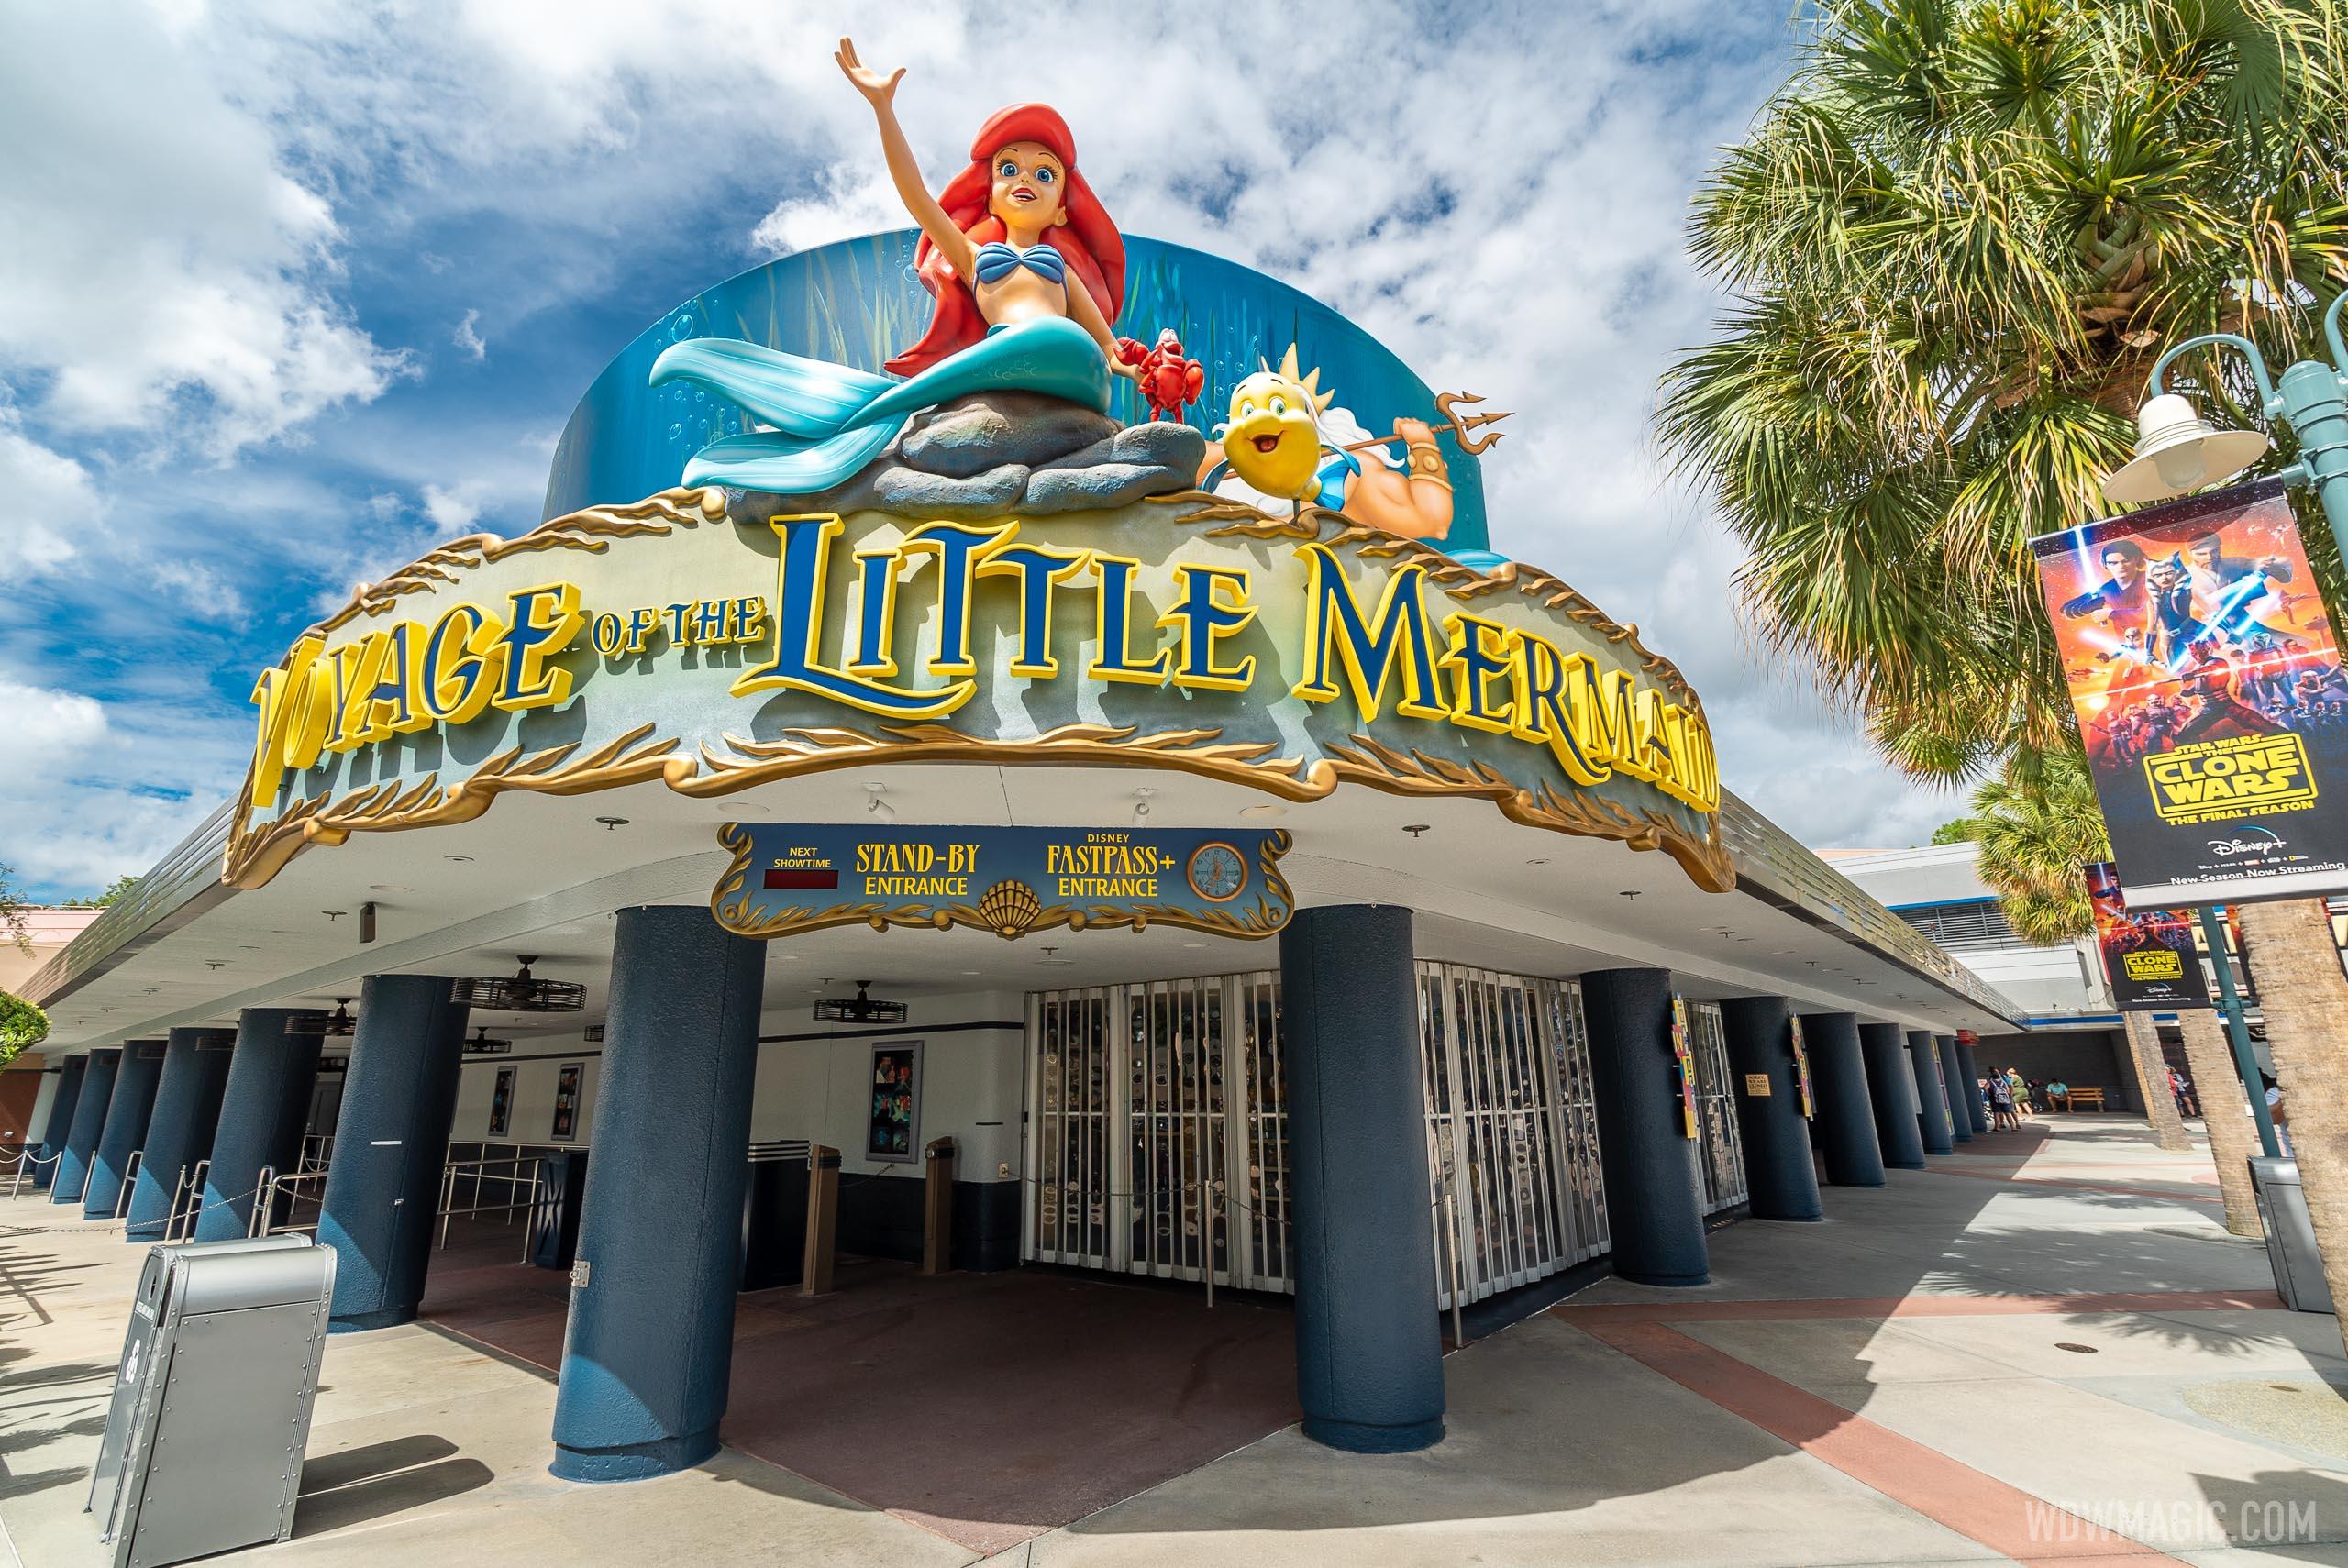 Live shows seem a long way off returning to Walt Disney World